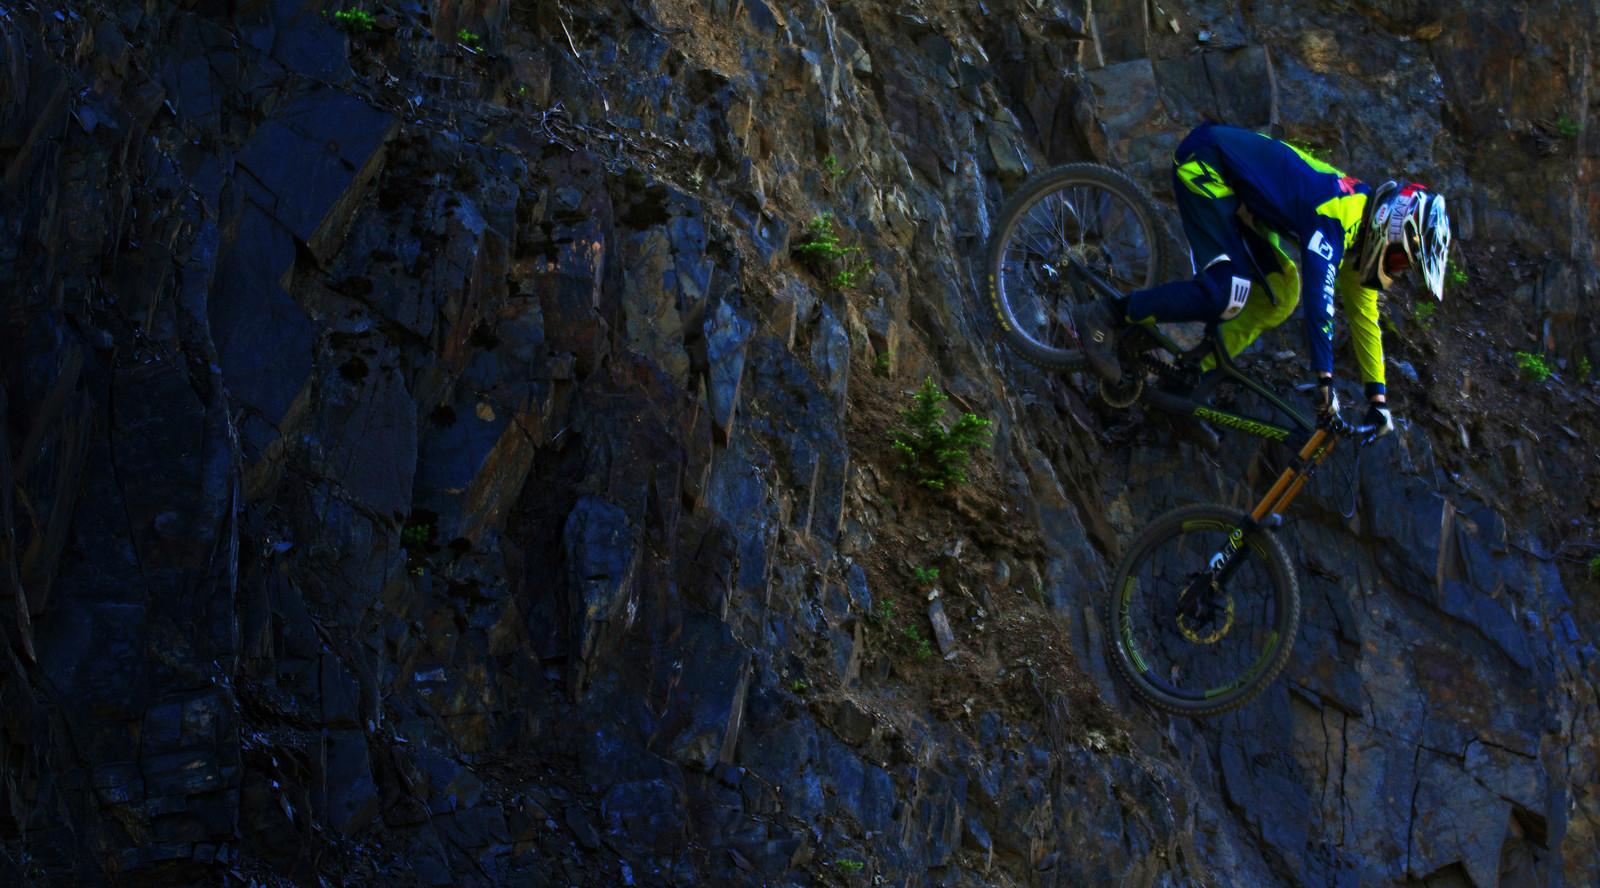 The Shale Wall - Dylan Kish - Mountain Biking Pictures - Vital MTB